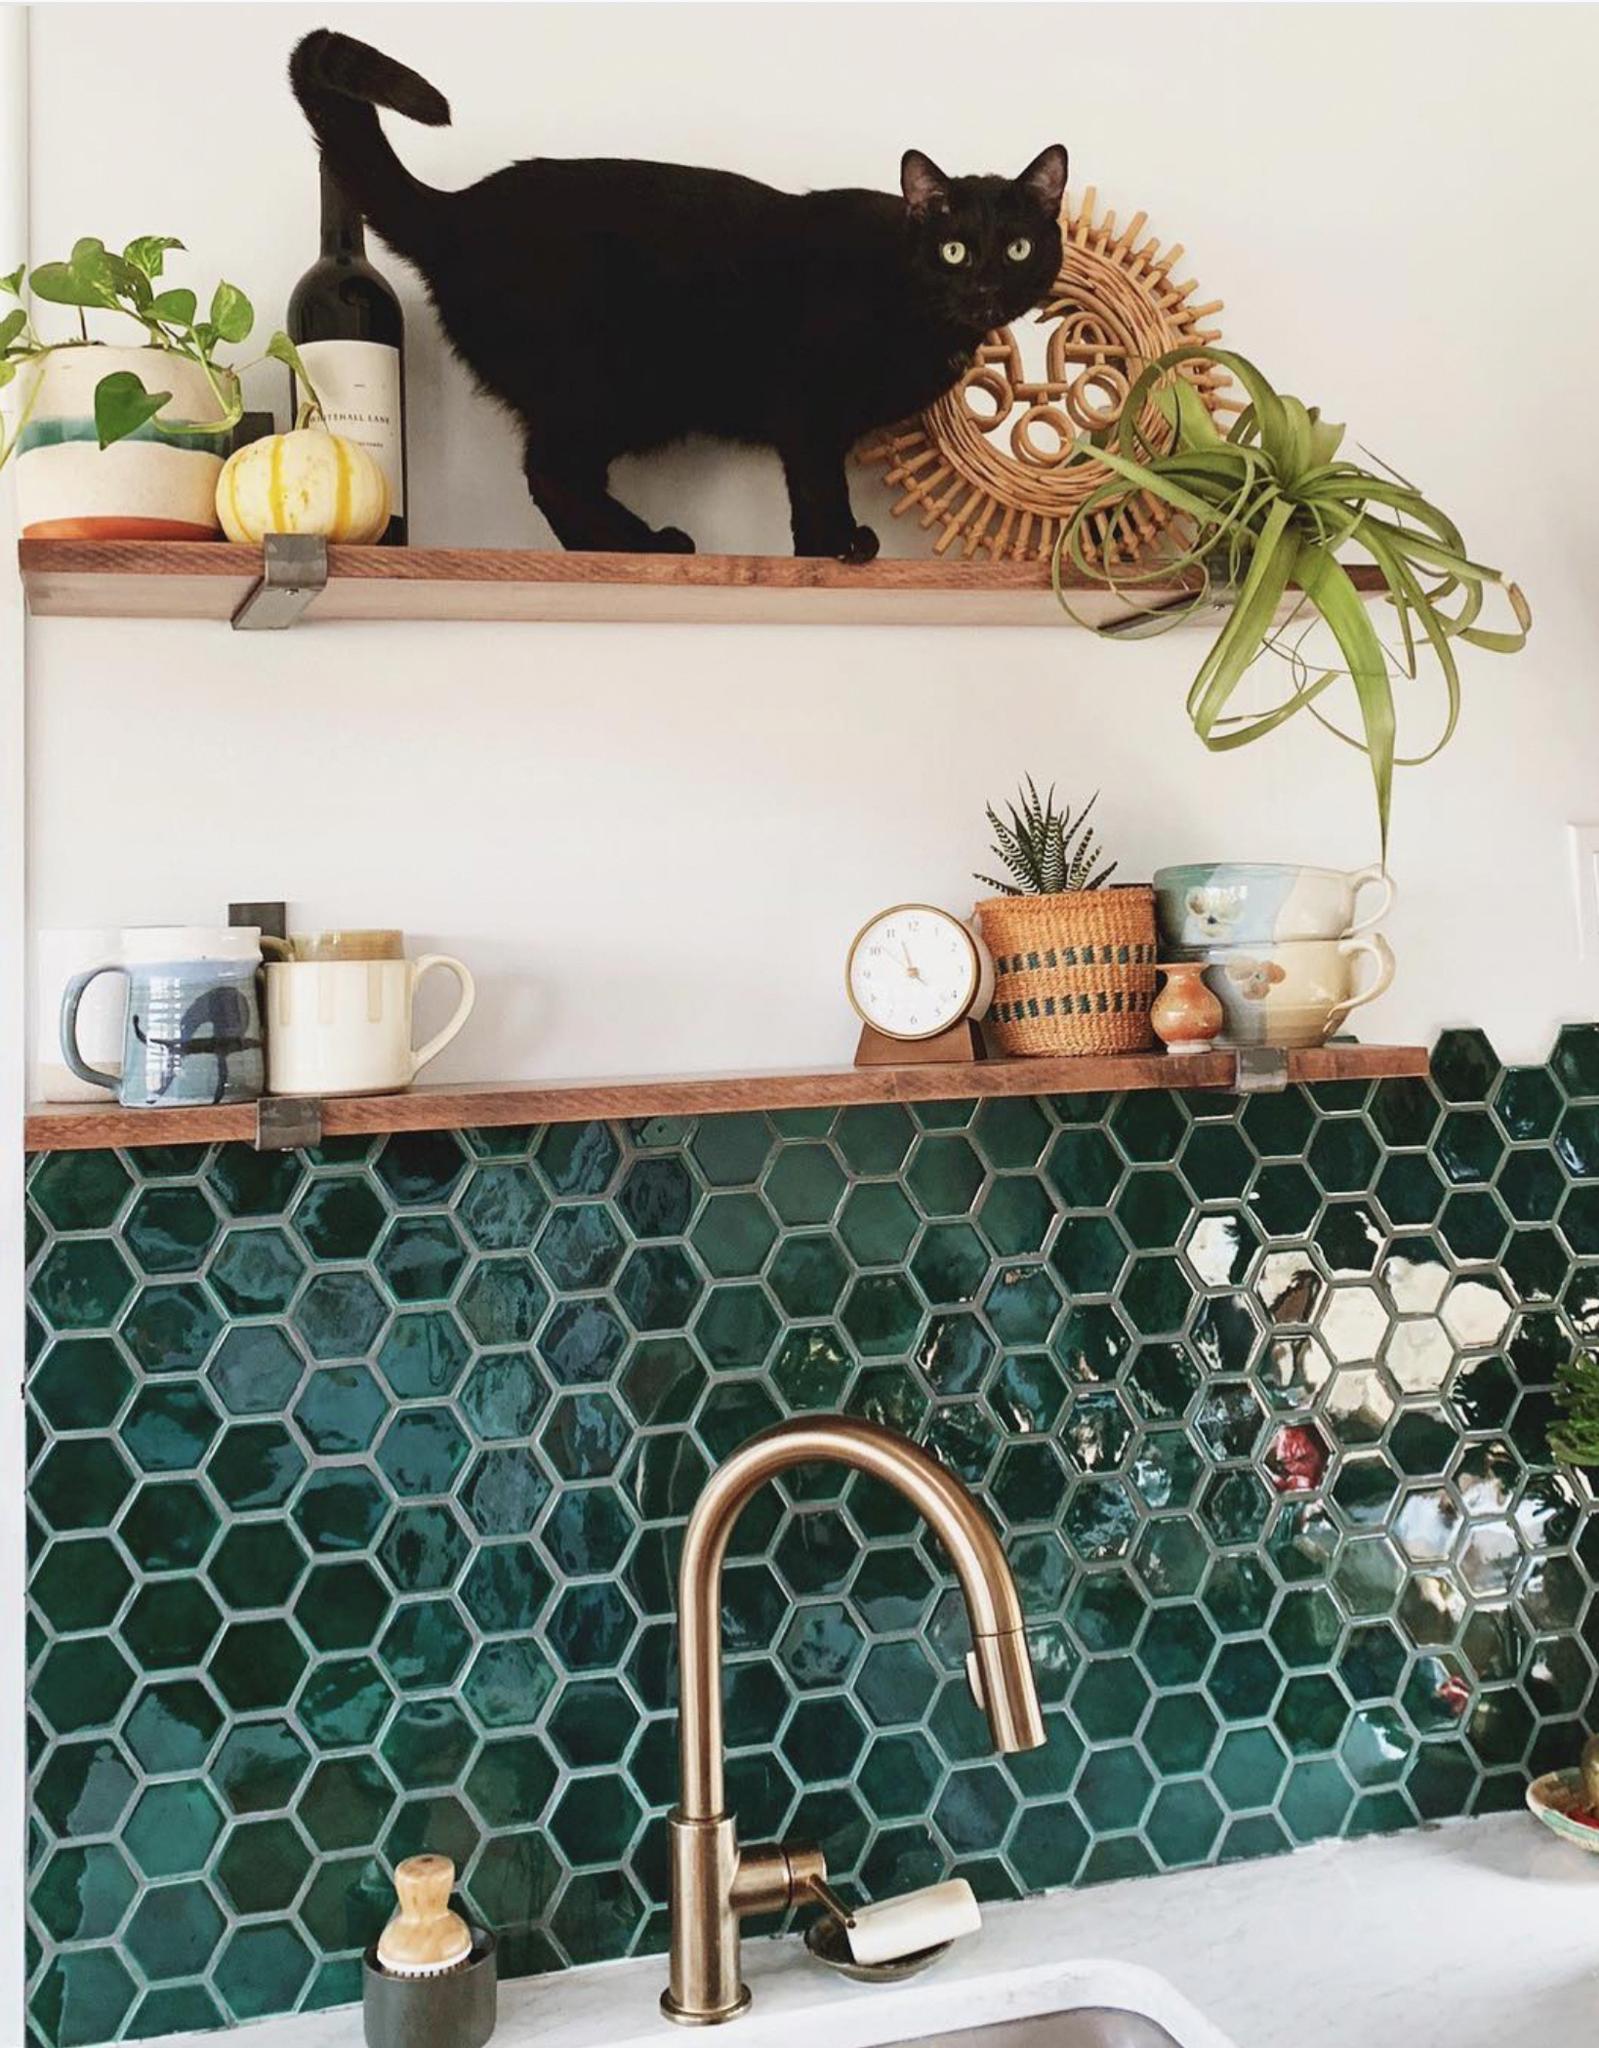 Small Green Hexagon Tile Backsplash Kitchentile Kitchen Tiles Design Hexagon Tile Backsplash Kitchen Tiles Backsplash